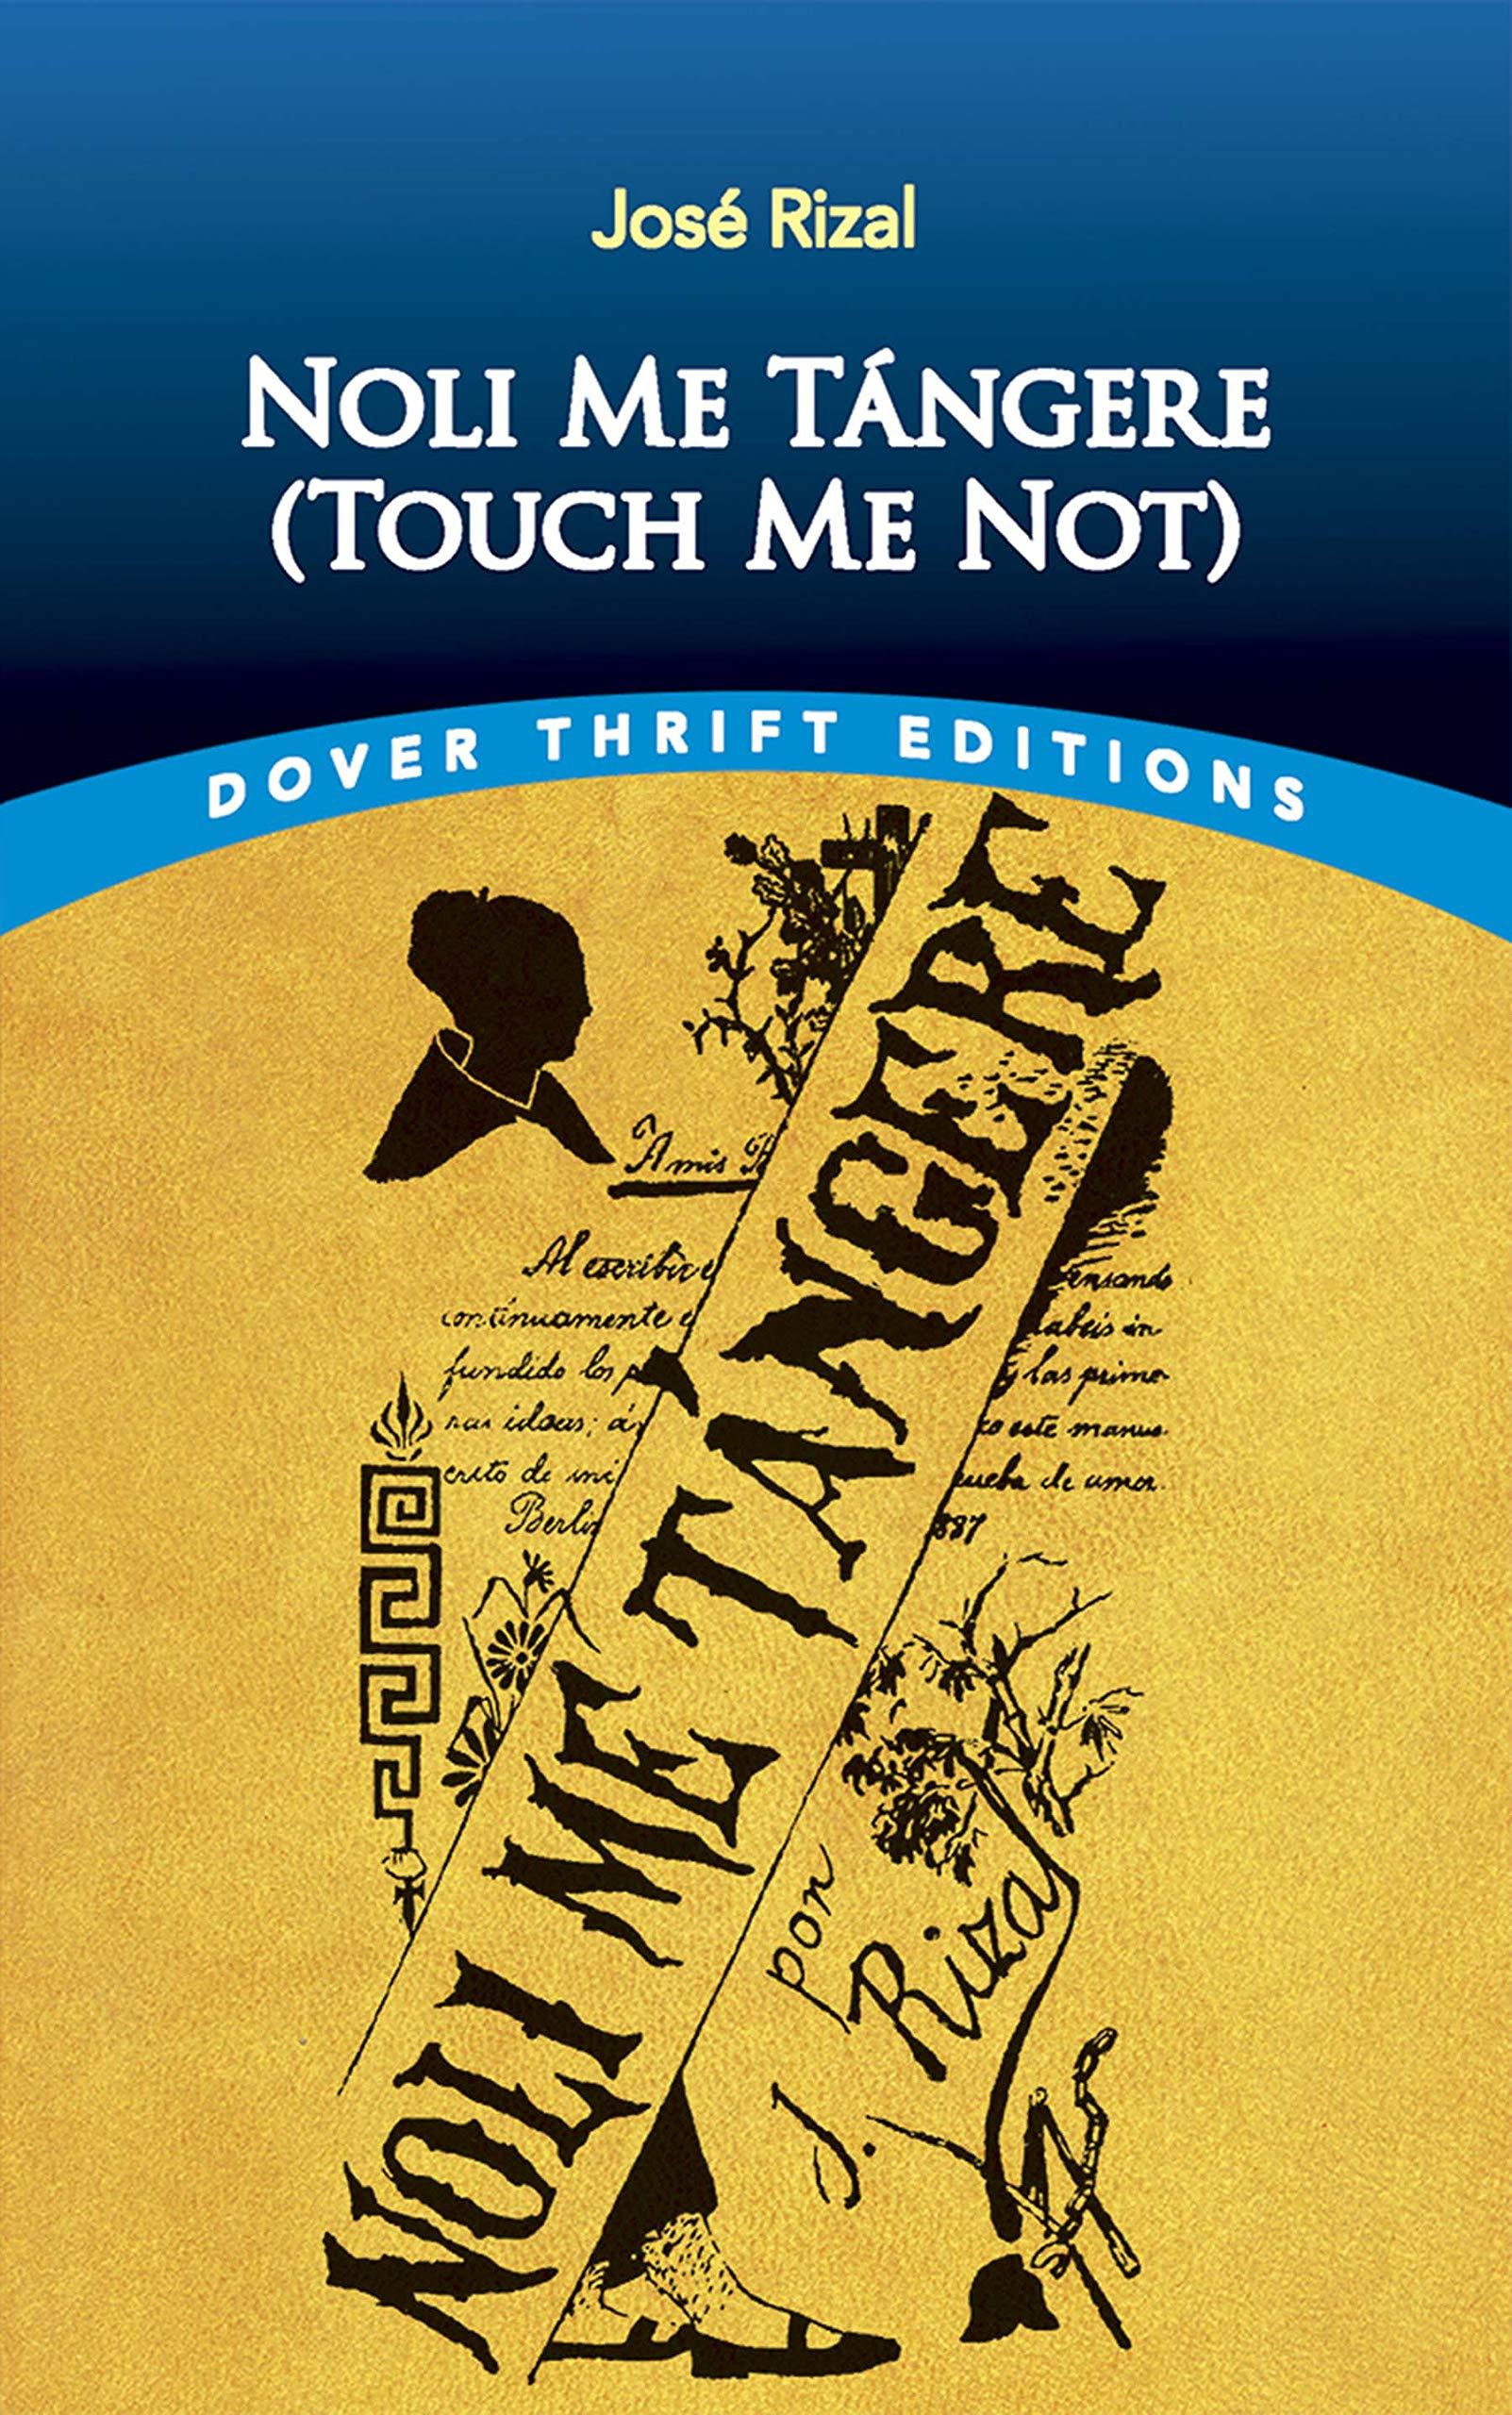 NOLI ME TANGERE TOUCH ME NOT Dover Thrift Editions Amazon.de ...